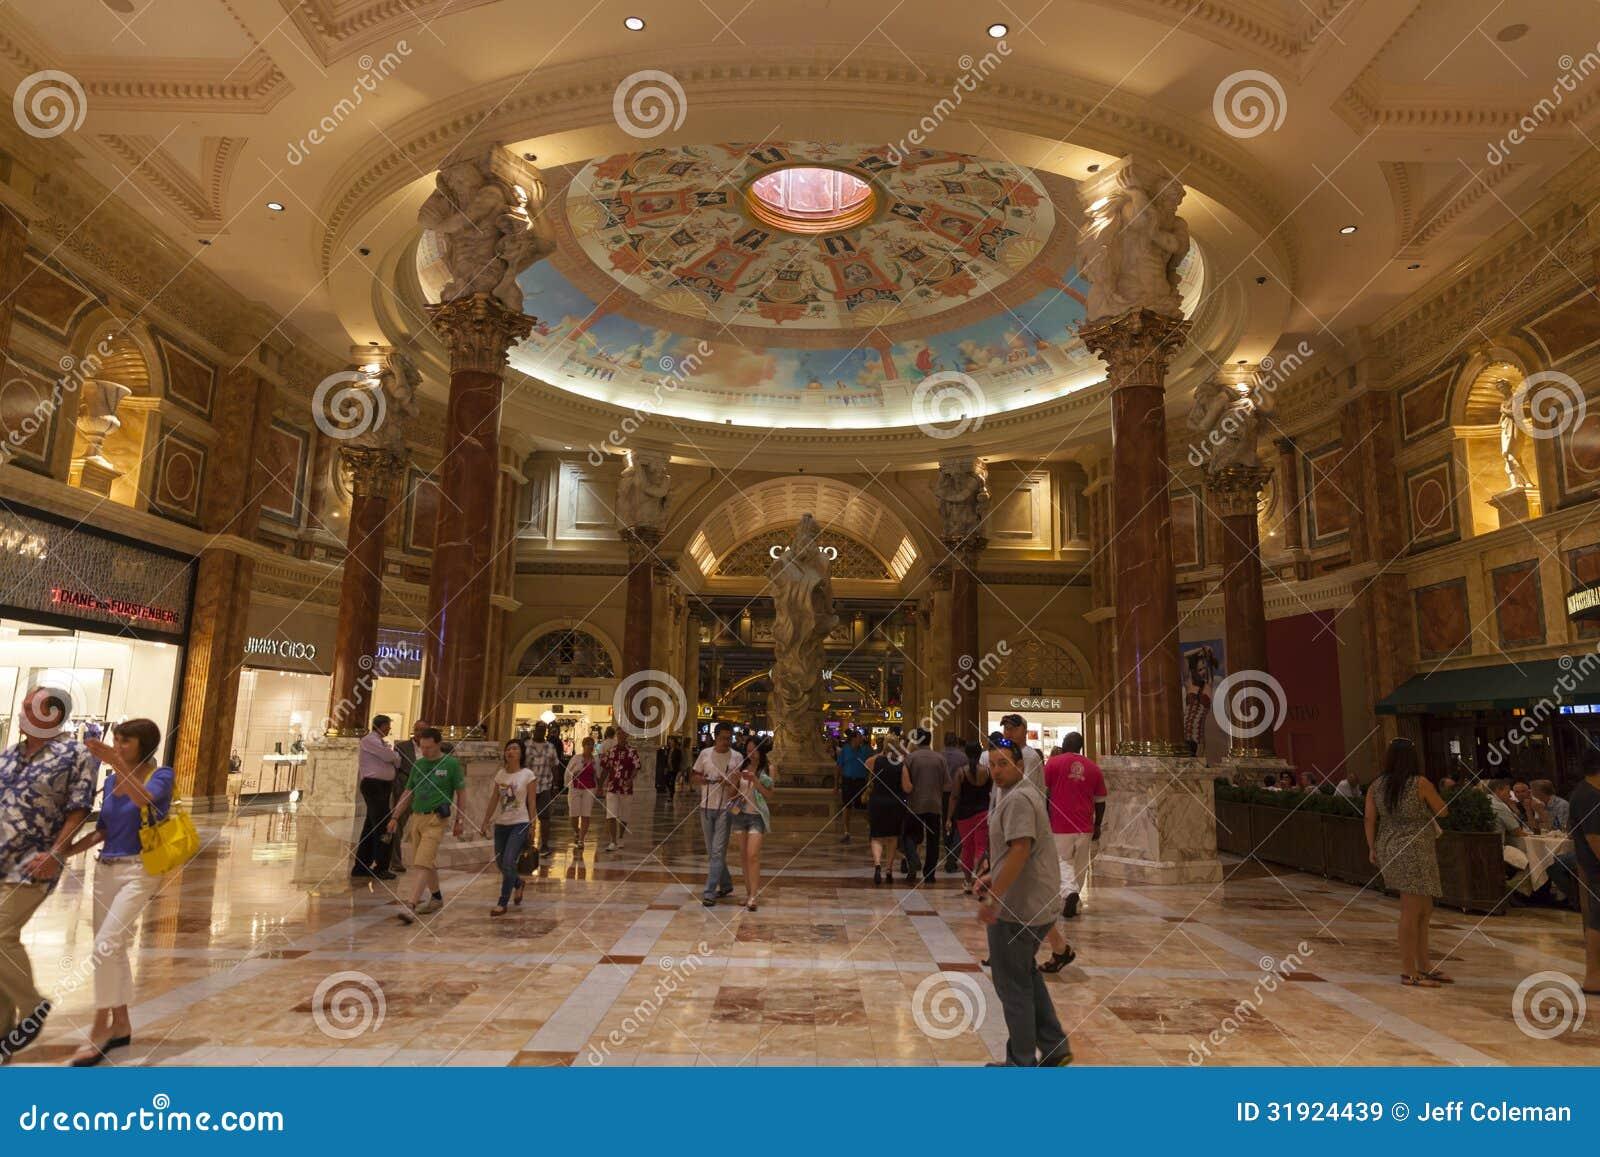 Casino Floor Plans Caesars Palace Forum Shops Casino Entrance In Las Vegas